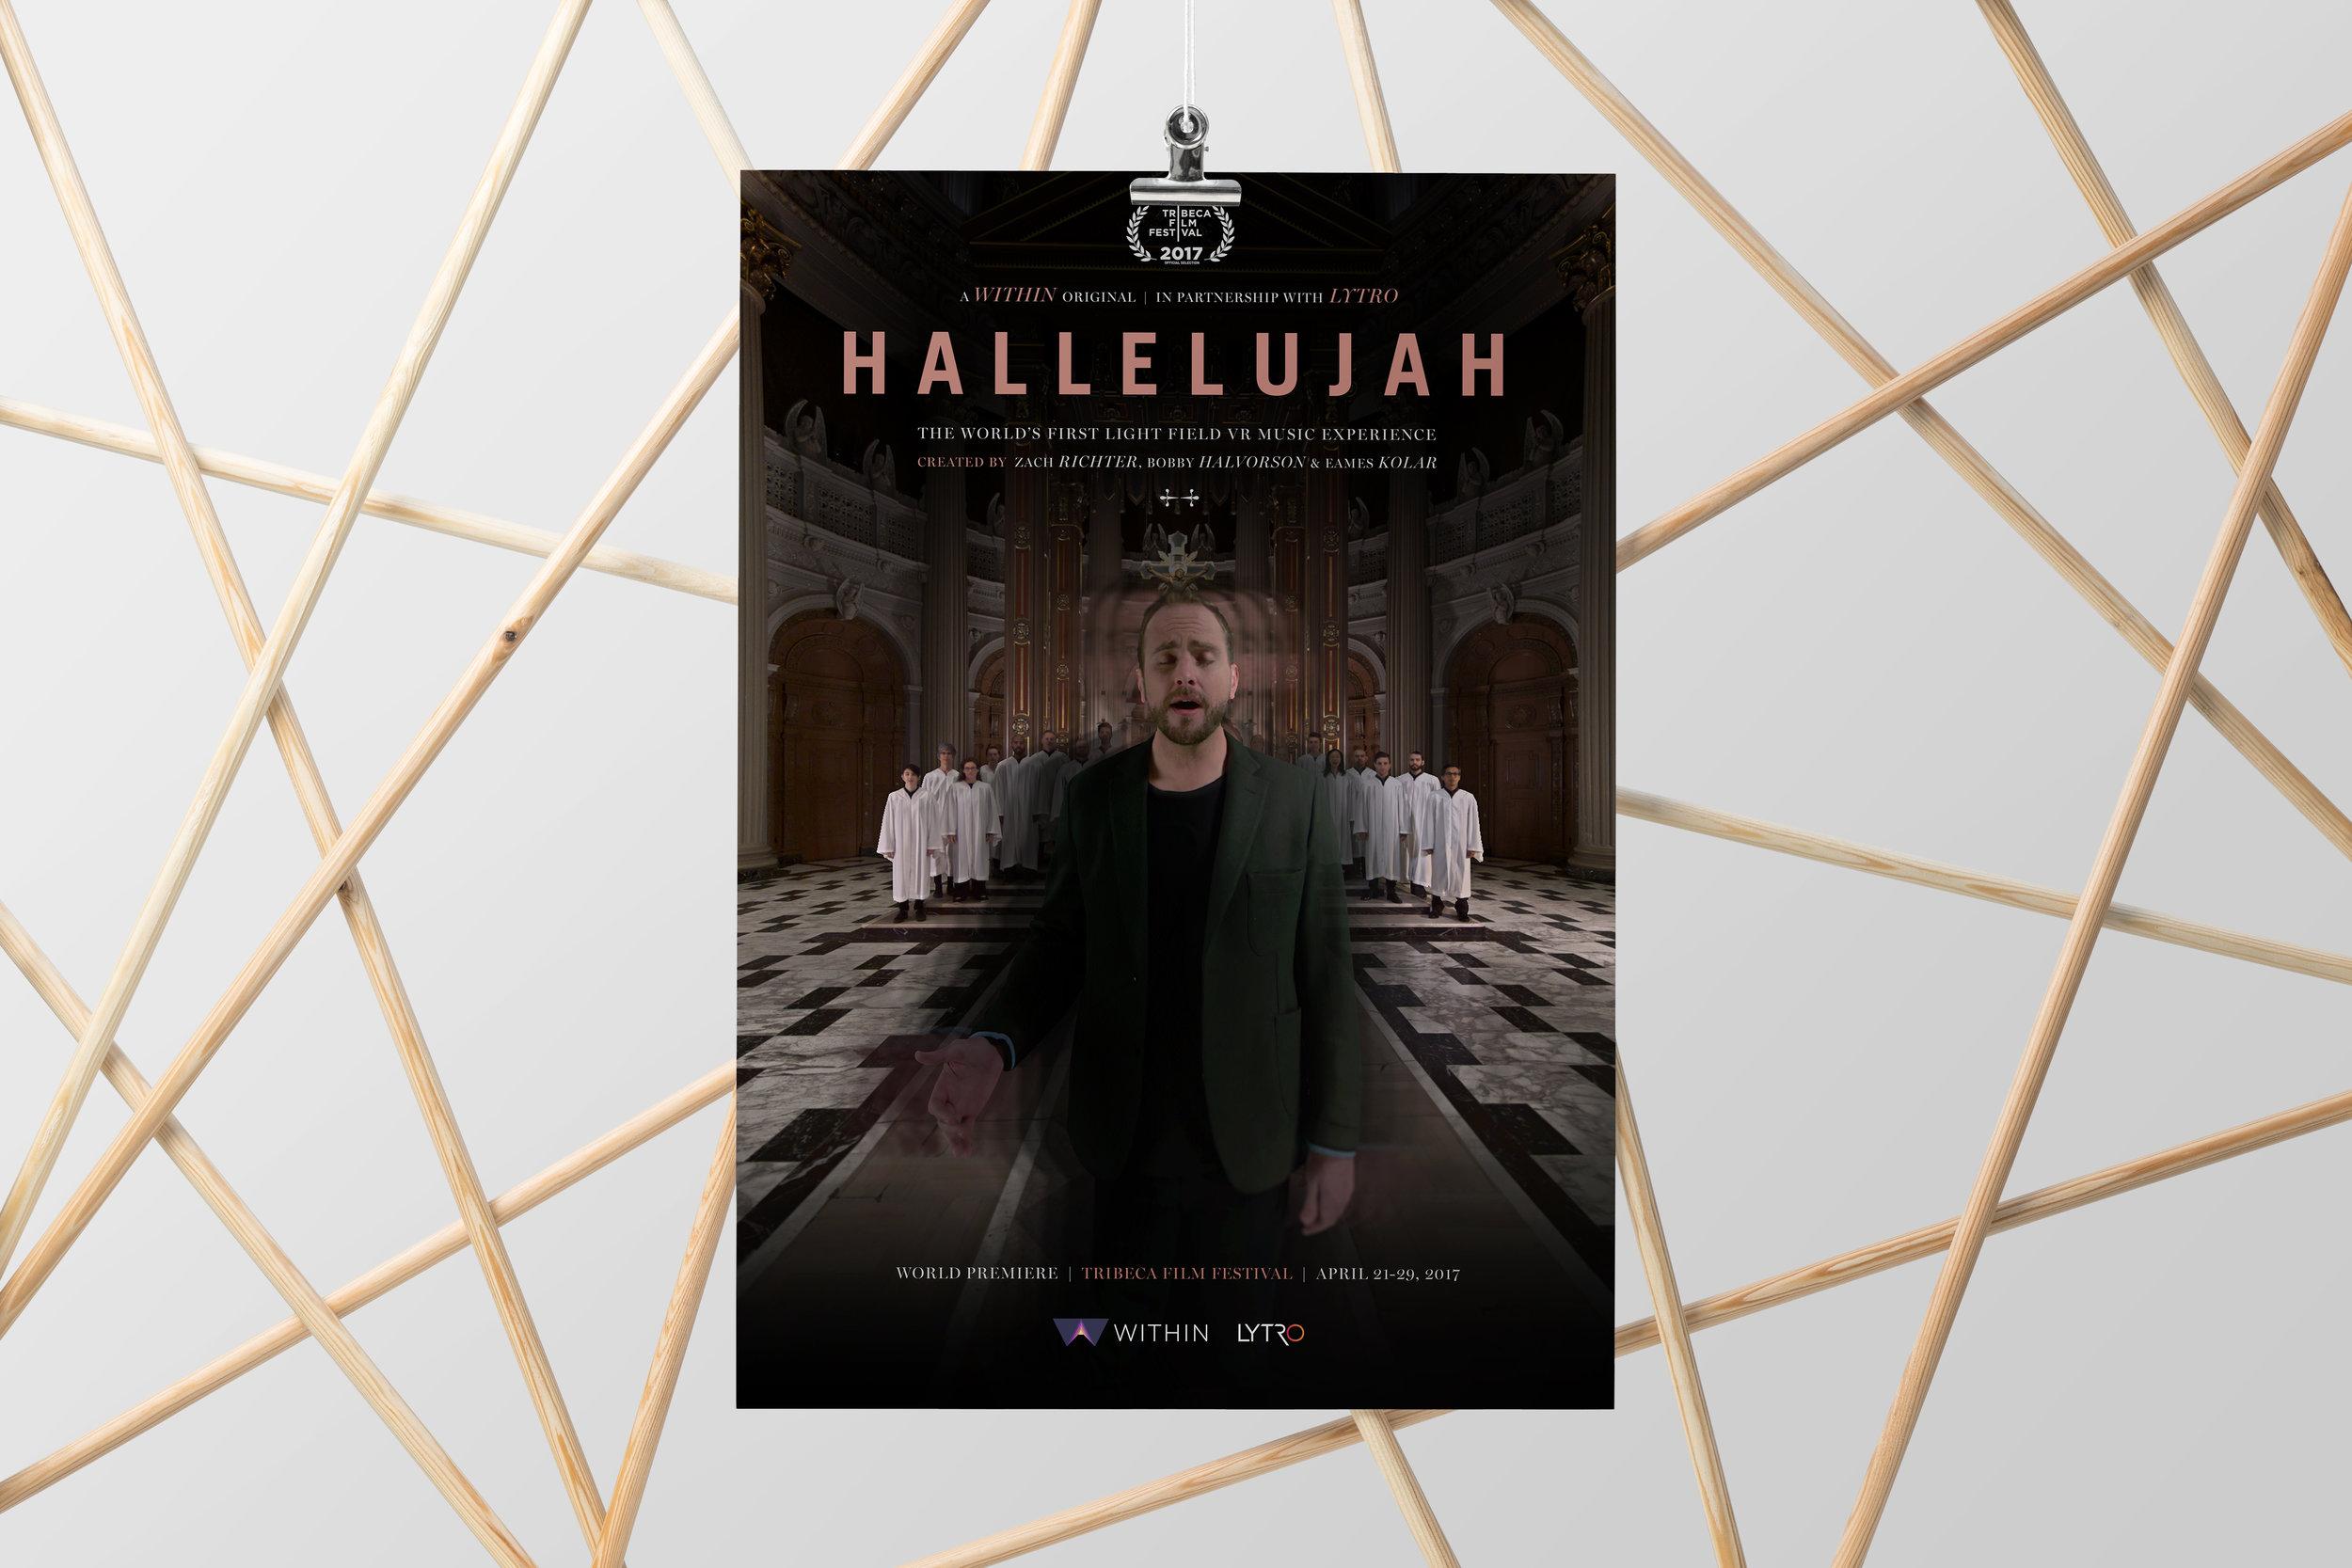 'Hallelujah' premiere poster